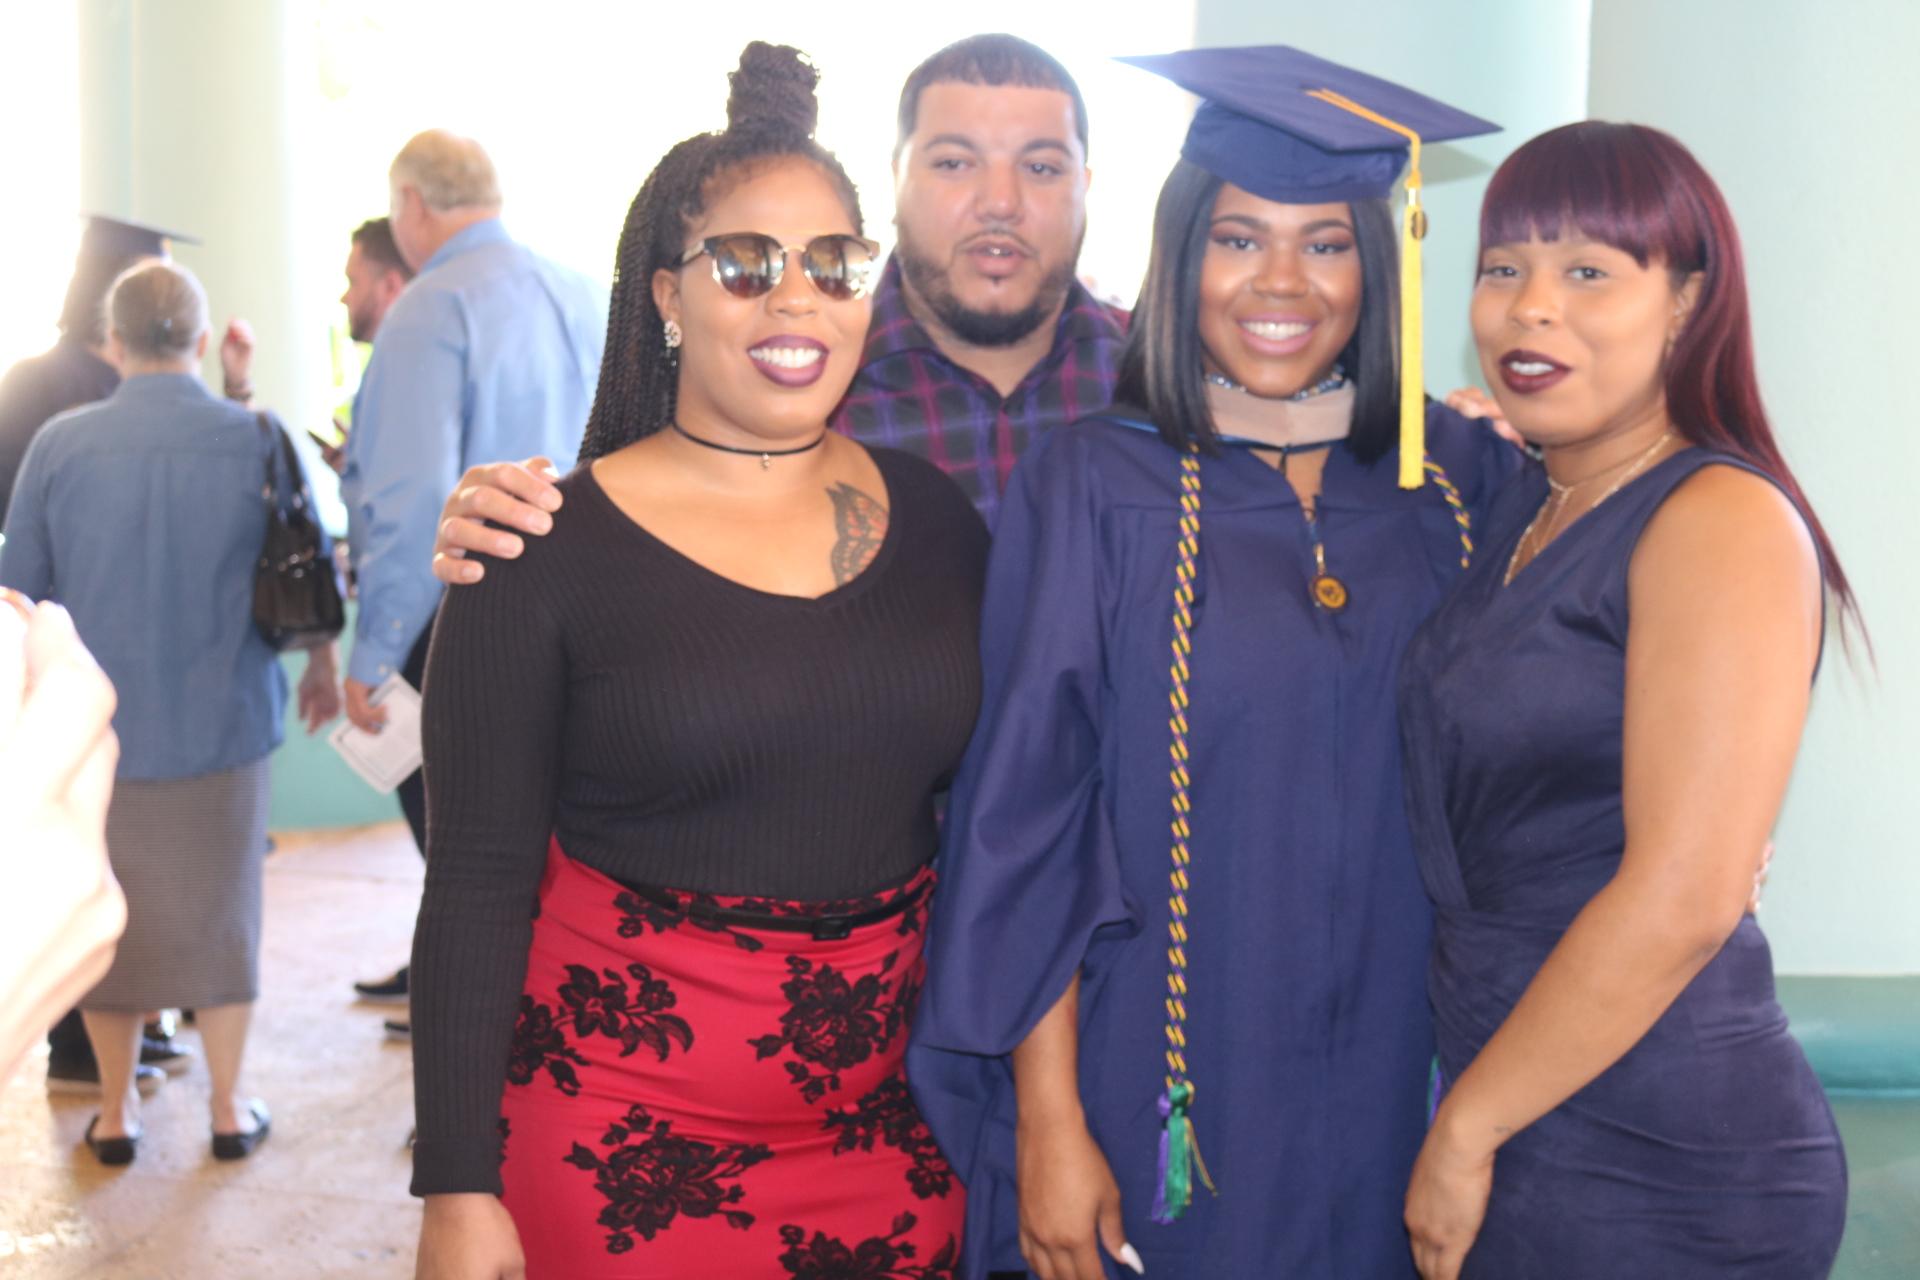 puerto rico rio grande review atv mom blog motherhood savvy mom working mother wgu graduation